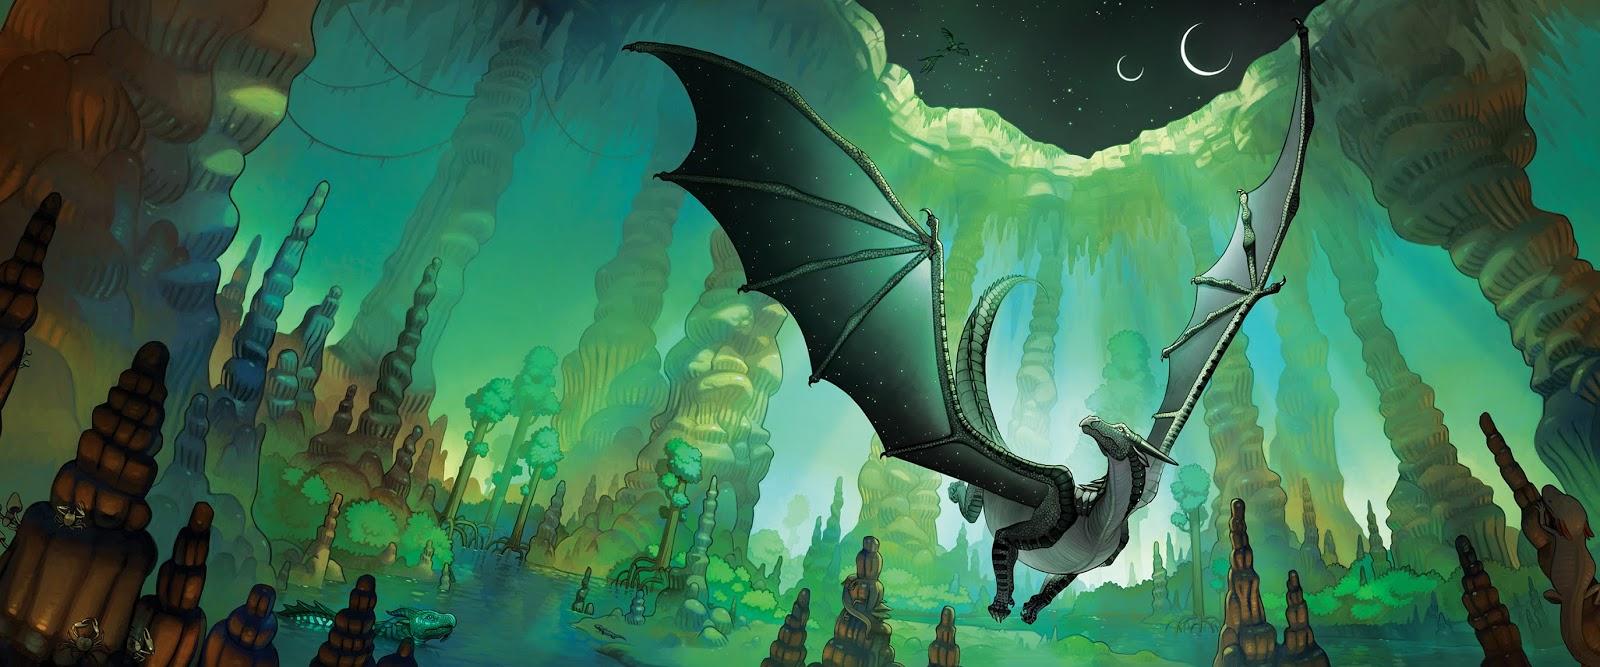 Felina Lune Kavi's V O I C E : The Dragon's Flight into the